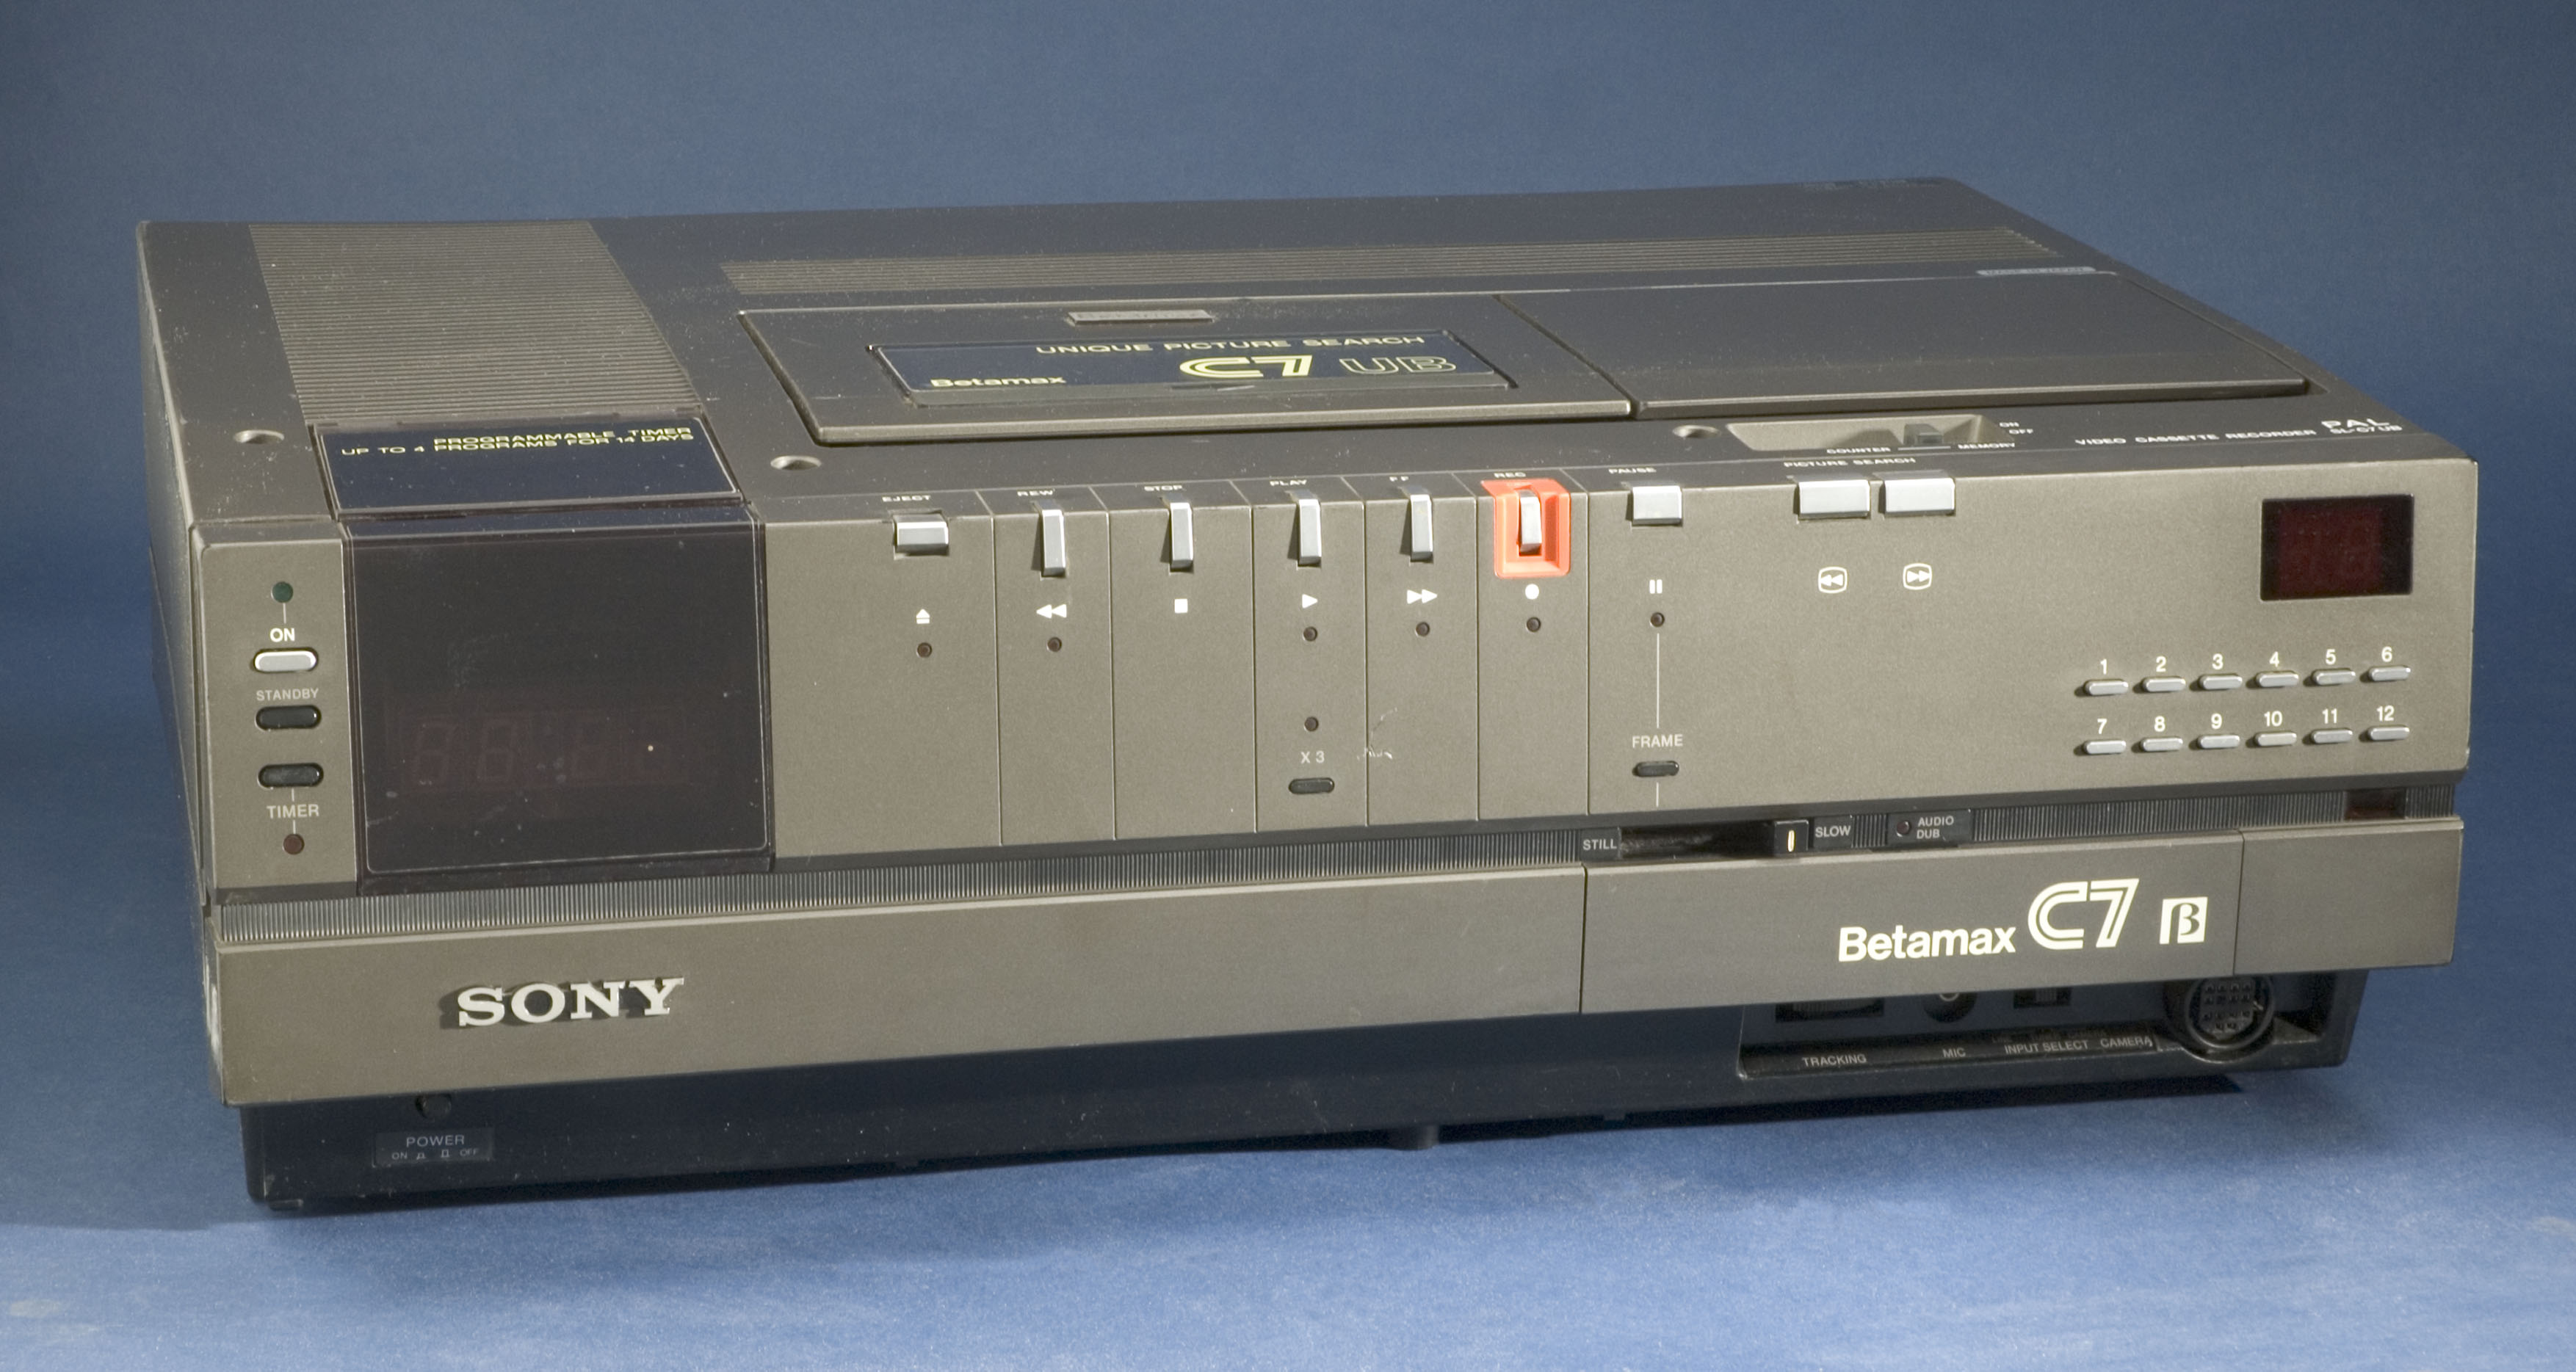 Detail of a Sony Betamax SL-C7 machine, c 1980